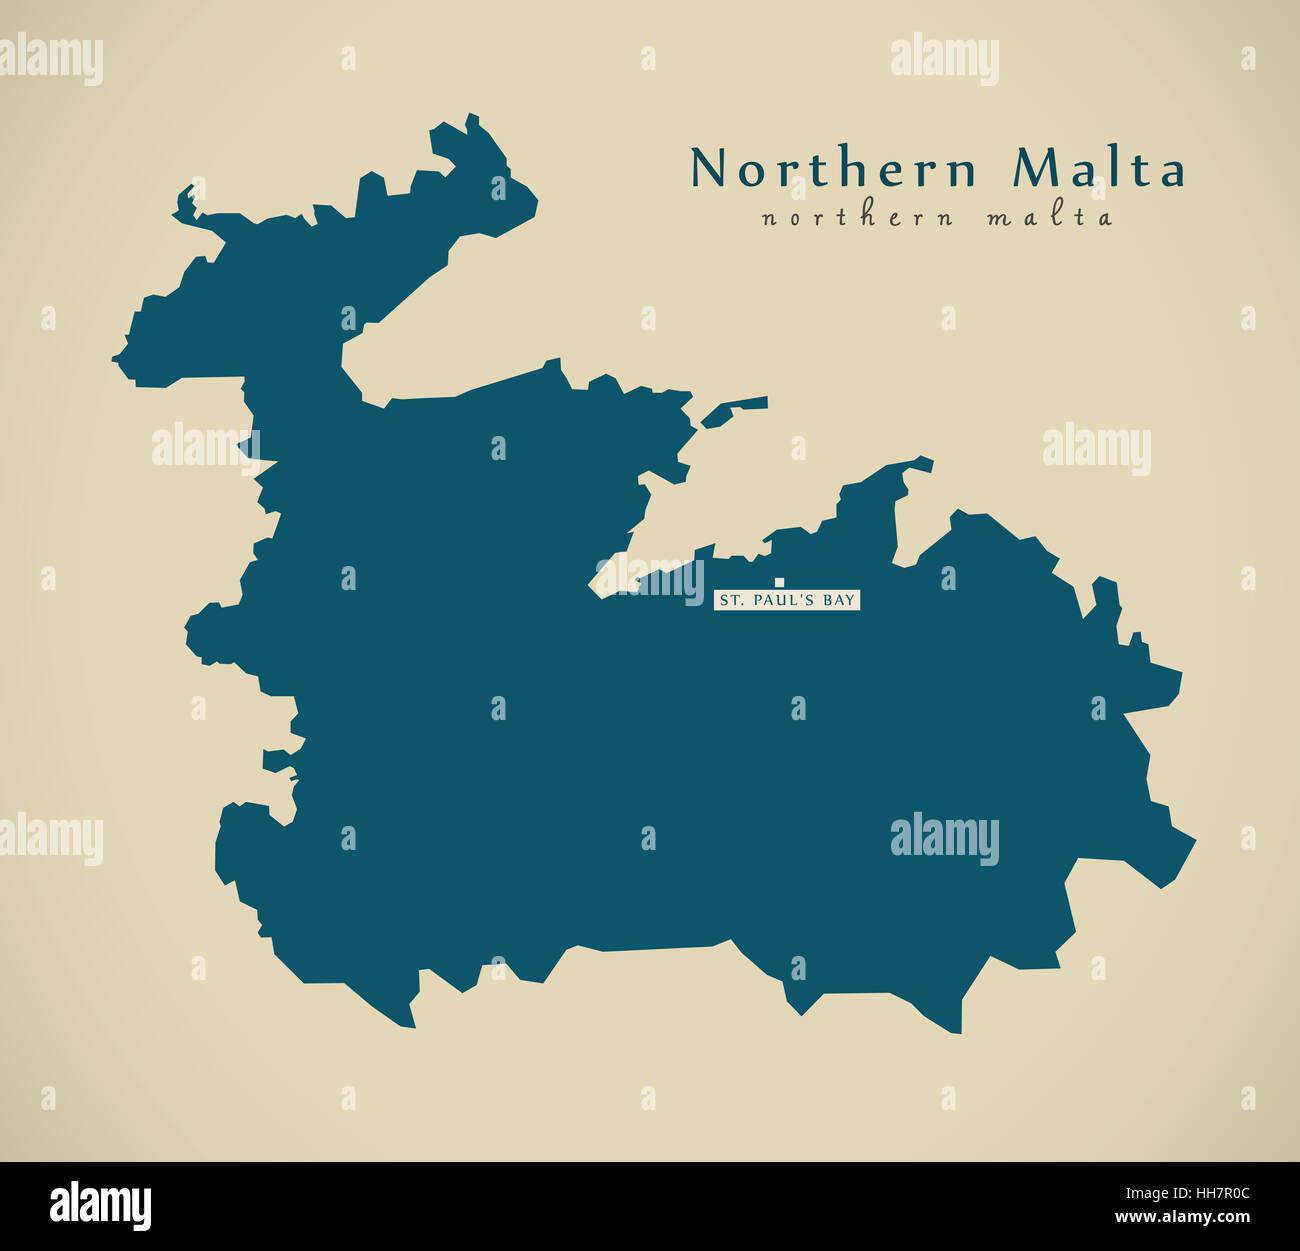 Modern Map - Northern Malta MT illustration - Stock Image